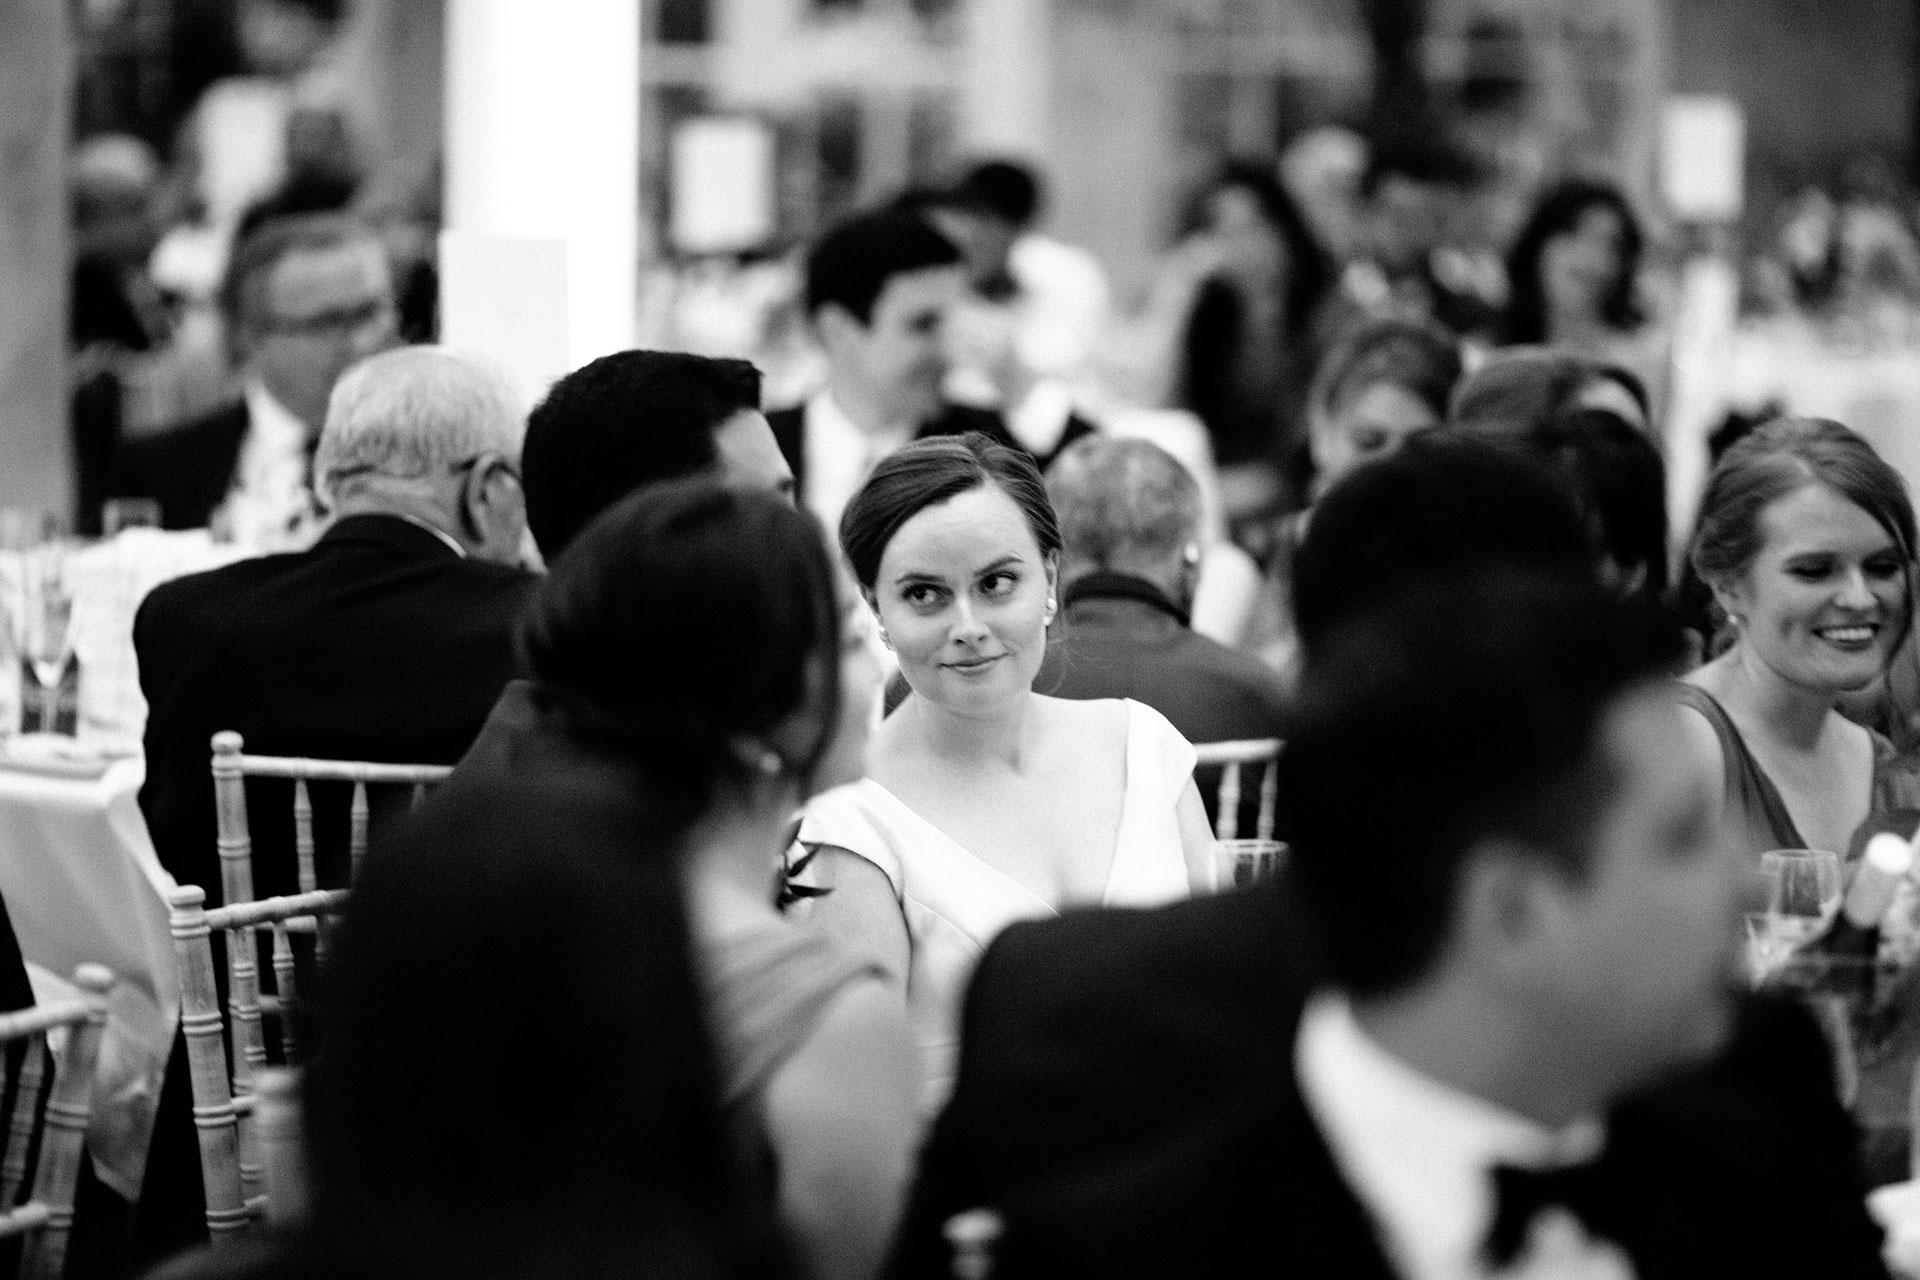 Syon-Park-Wedding-Photographer--_-Michael-Newington-Gray-766.jpg